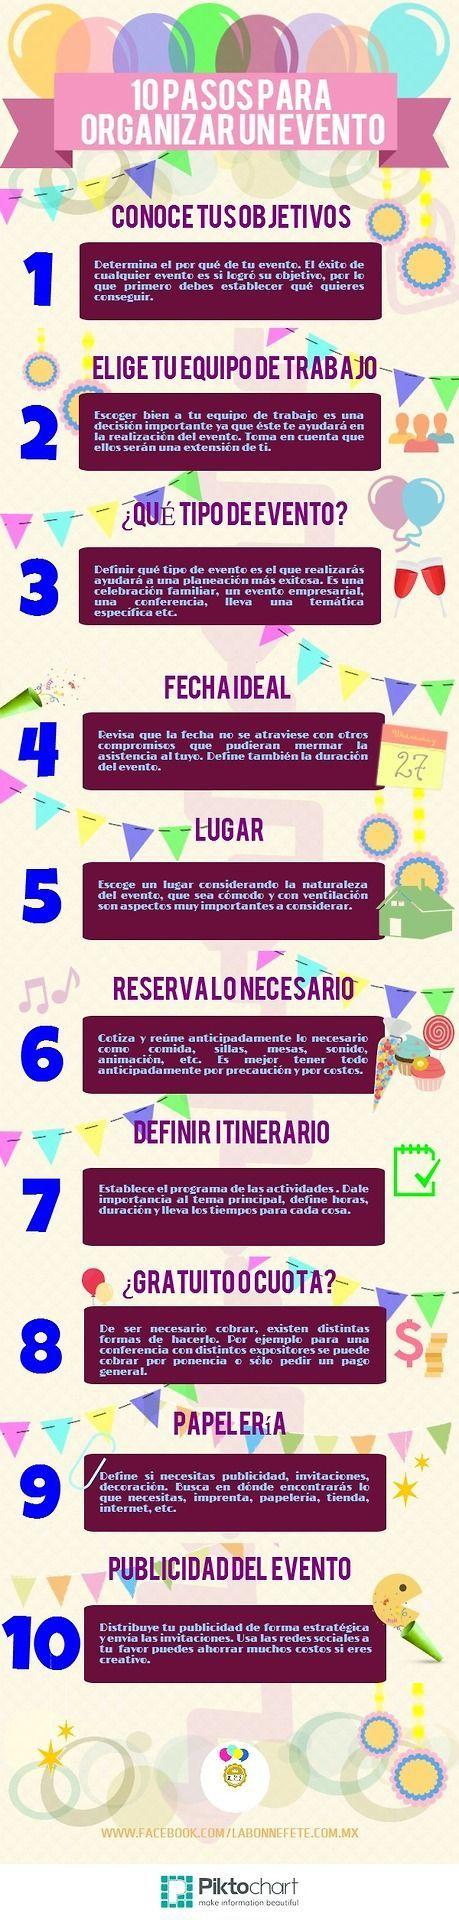 10 pasos para organizar un evento #ideassoneventos #infografia #eventos #protocolo #weddingplanner #organizaciondeeventos #bodas #organizareventos